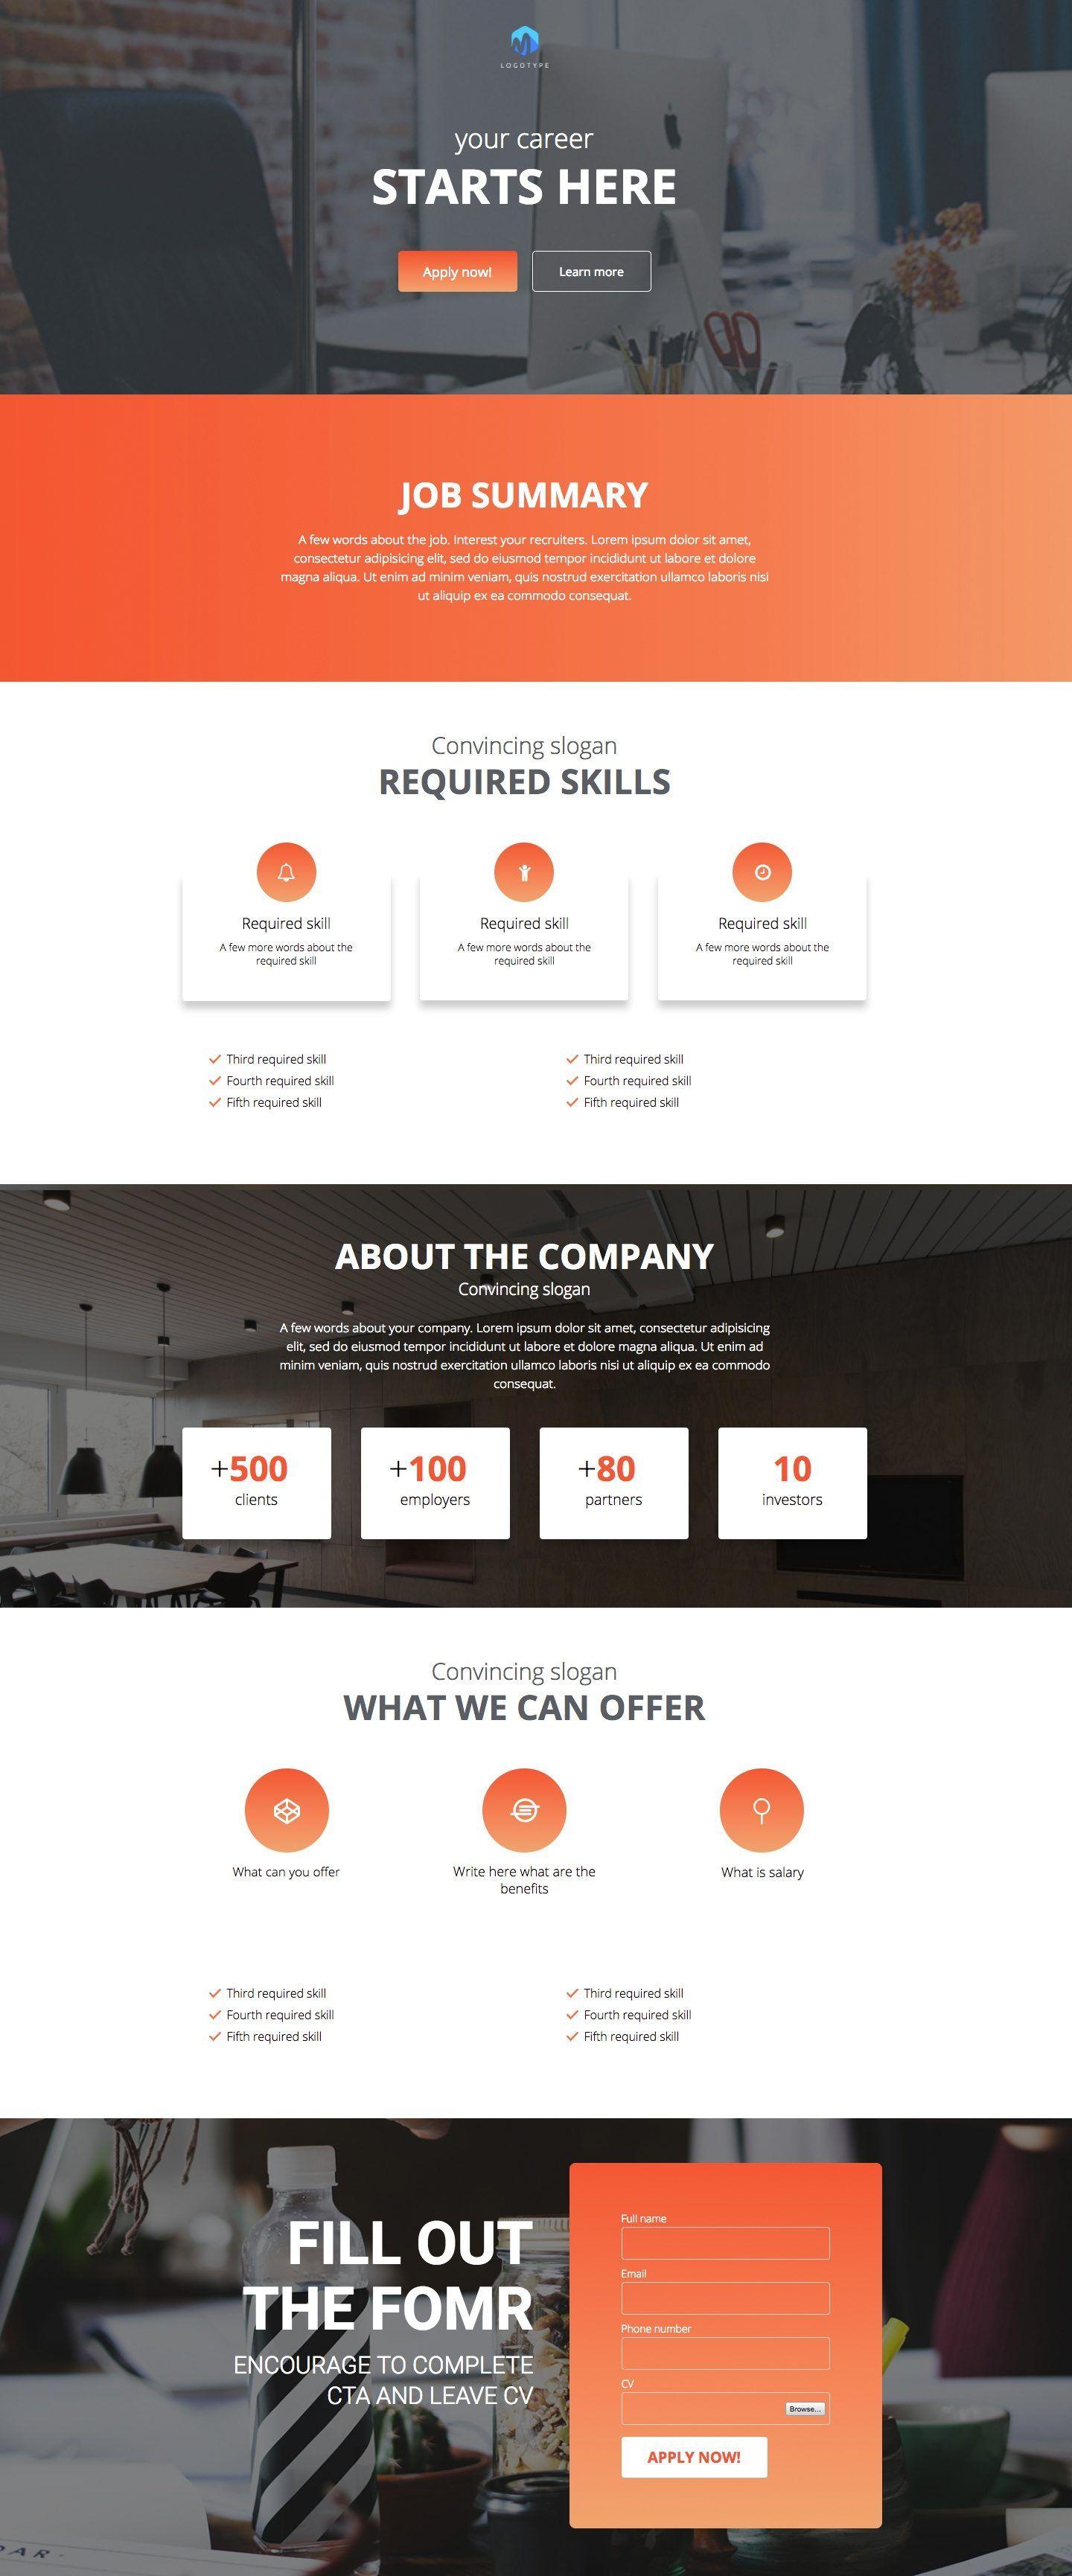 Startup is hiring